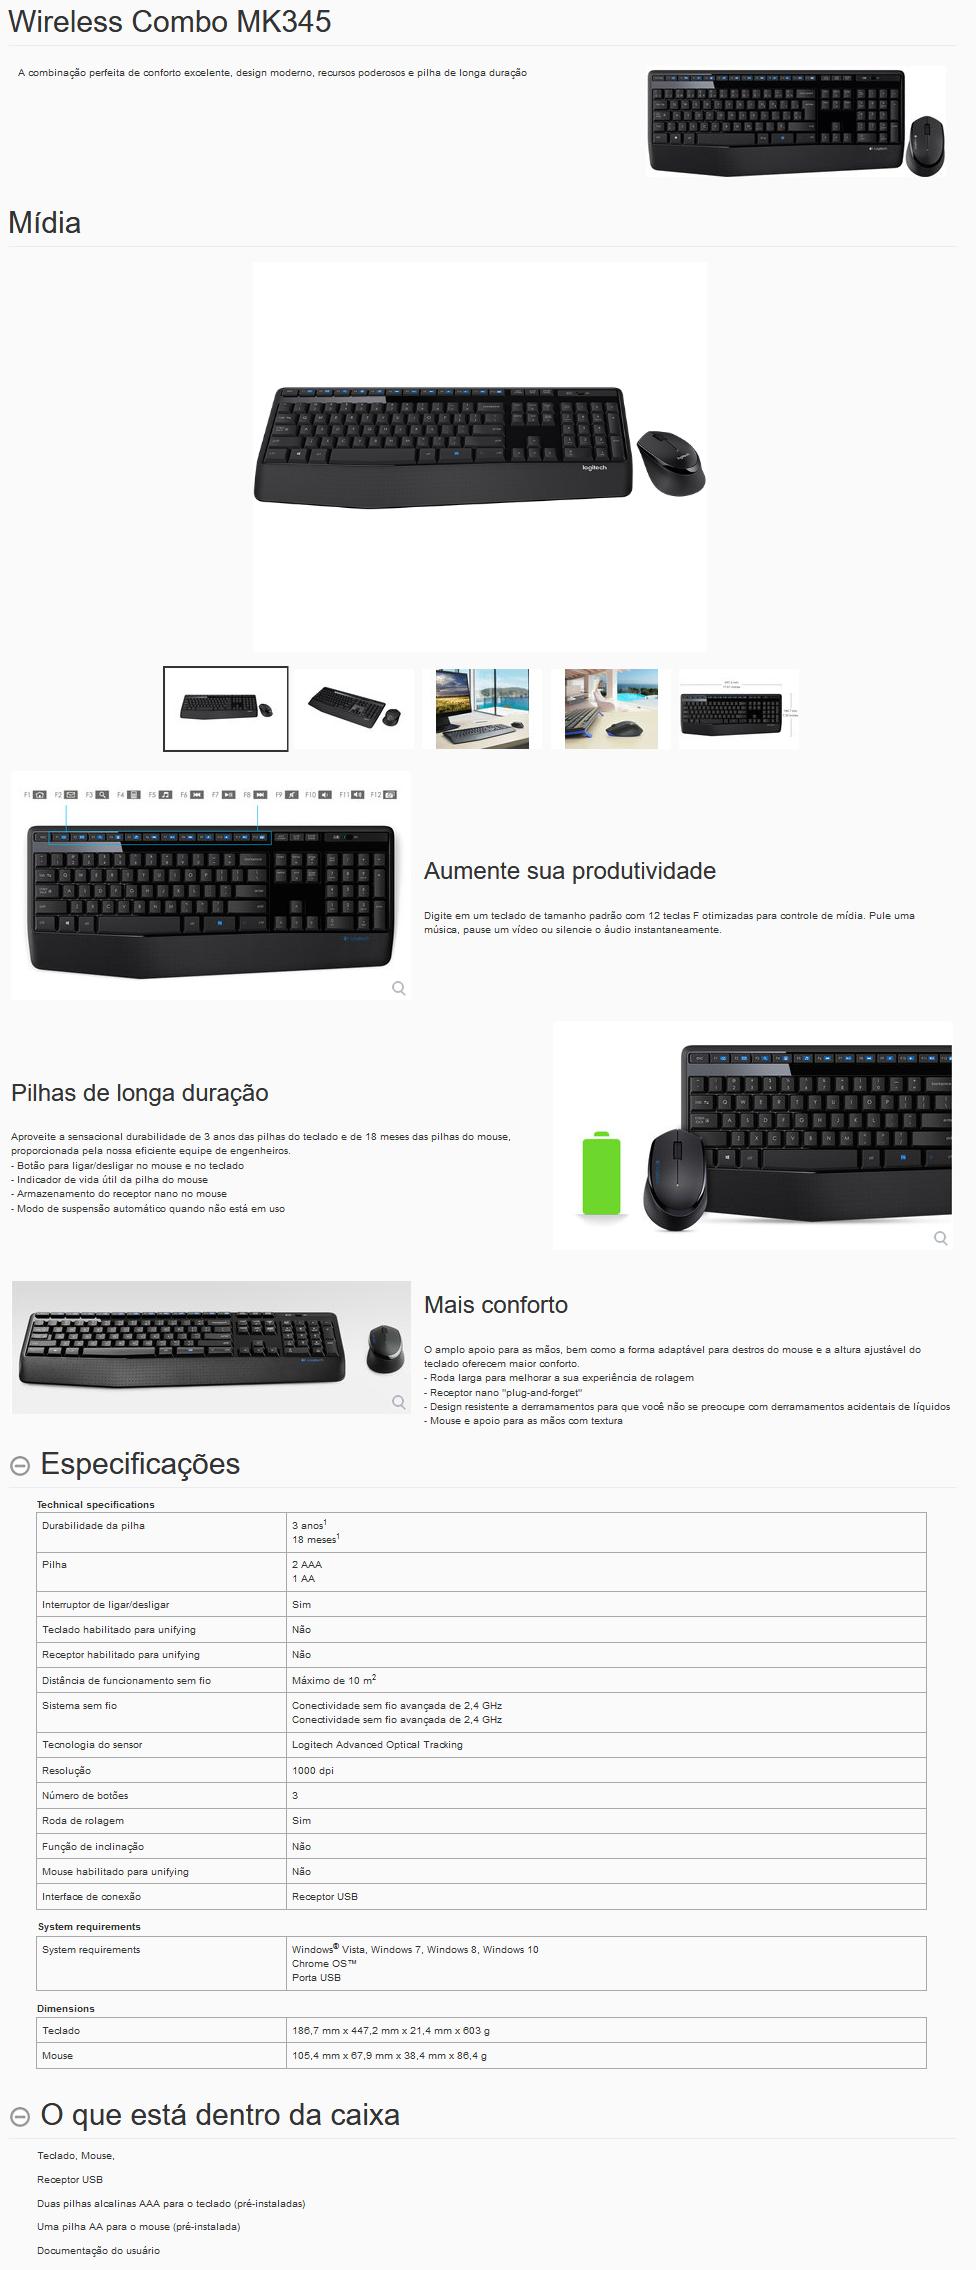 https://i.ibb.co/QCmx3SJ/Screenshot-2020-03-13-KIT-TECLADO-E-MOUSE-SEM-FIO-MK345-PRETO-LOGITECH-920-007821-Informatica-TI-Notebooks-Acess-rios-E.png